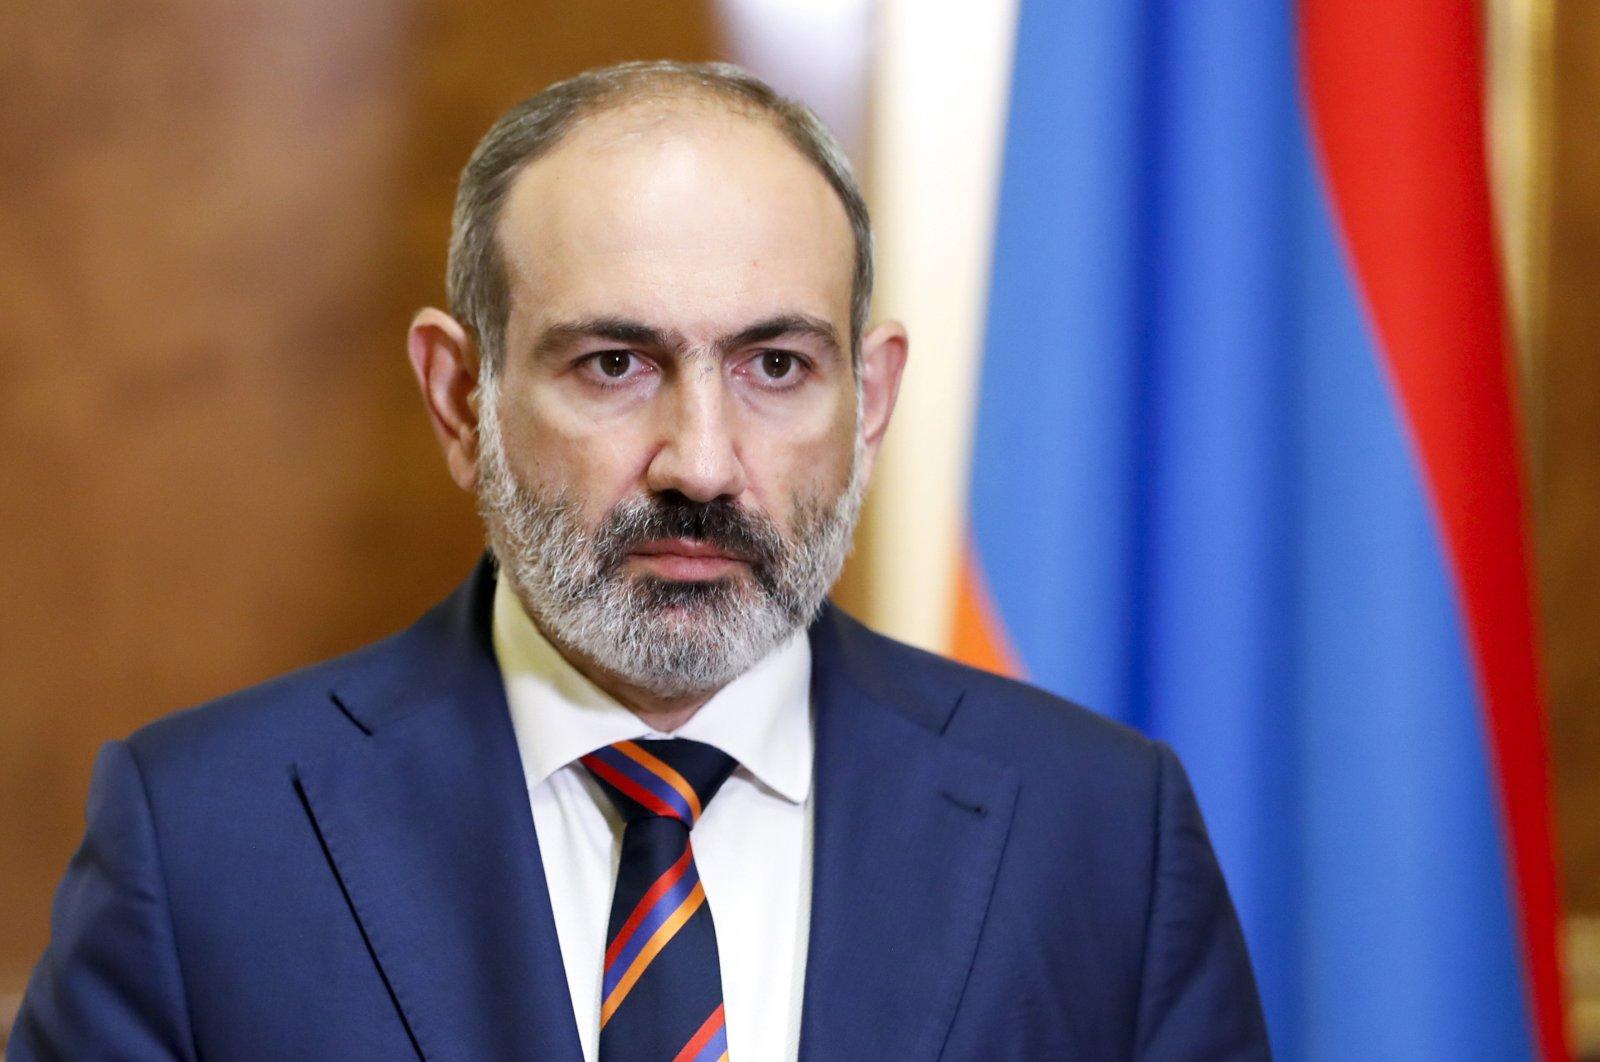 Armenian Prime Minister Nikol Pashinian pauses as he speaks at the Armenian parliament in Yerevan, Armenia, Sept. 27, 2020. (AP File Photo)